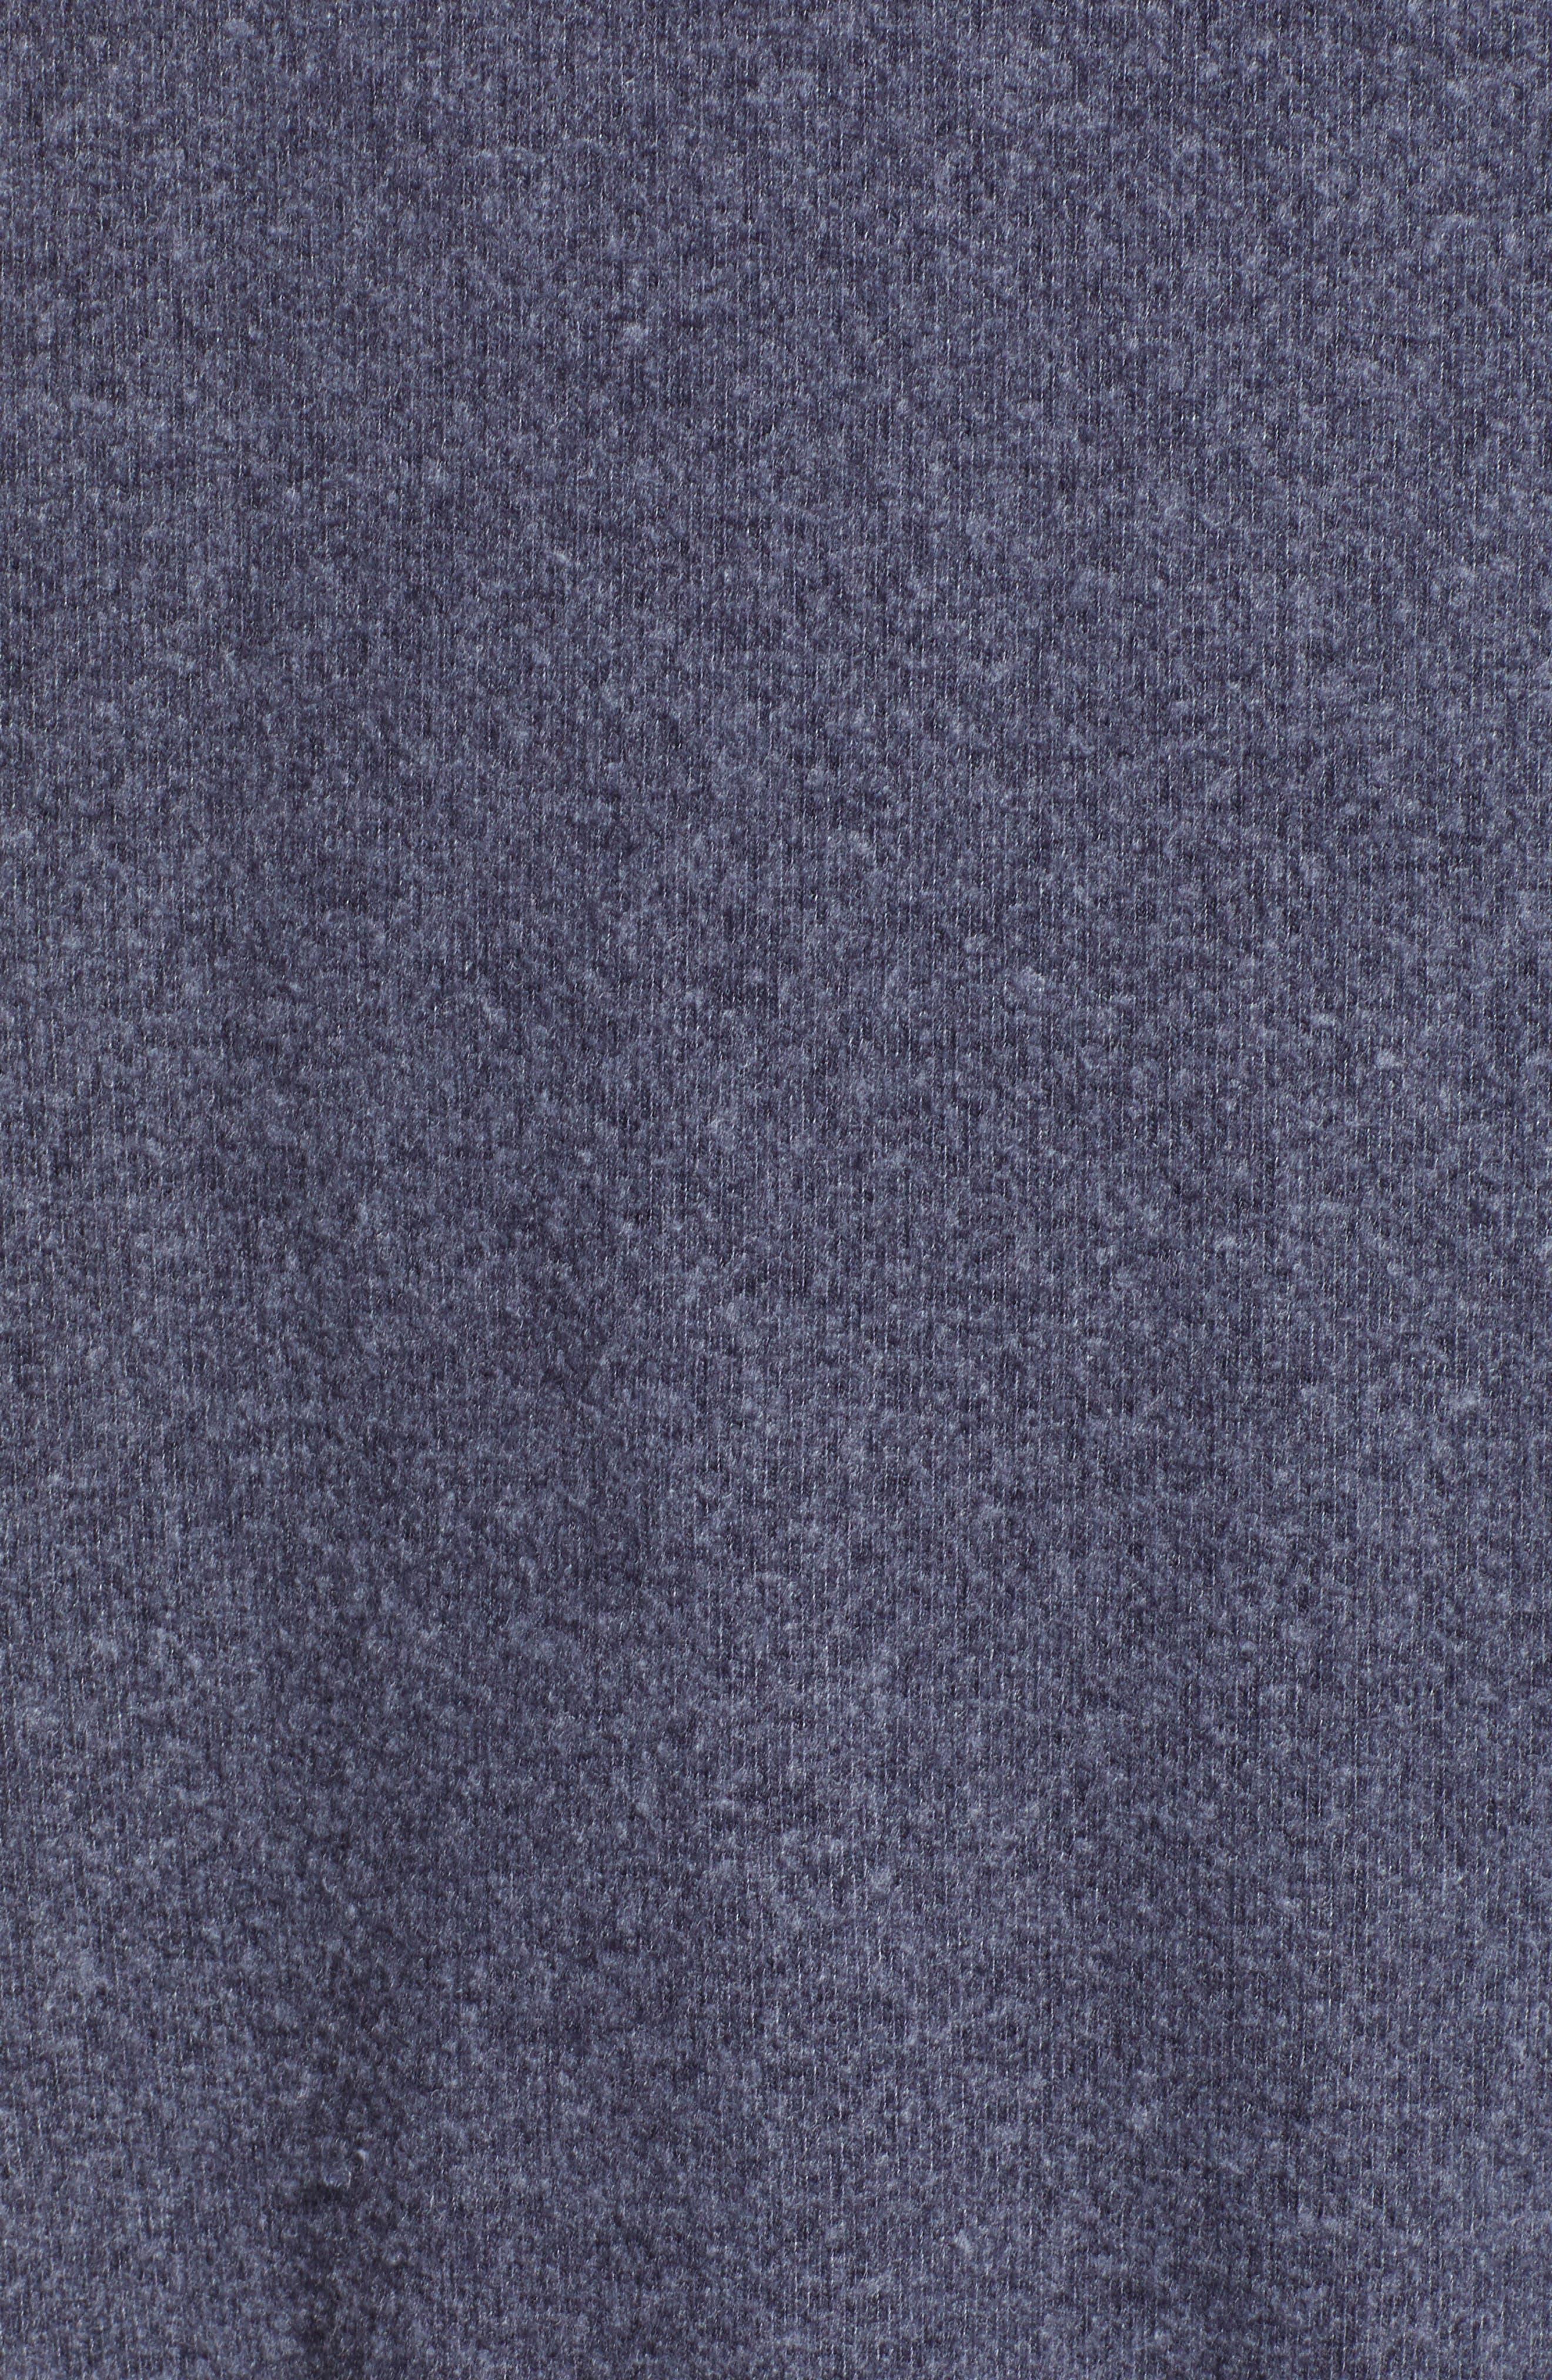 Roadtrip - New York's Finest Pullover,                             Alternate thumbnail 5, color,                             OXFORD